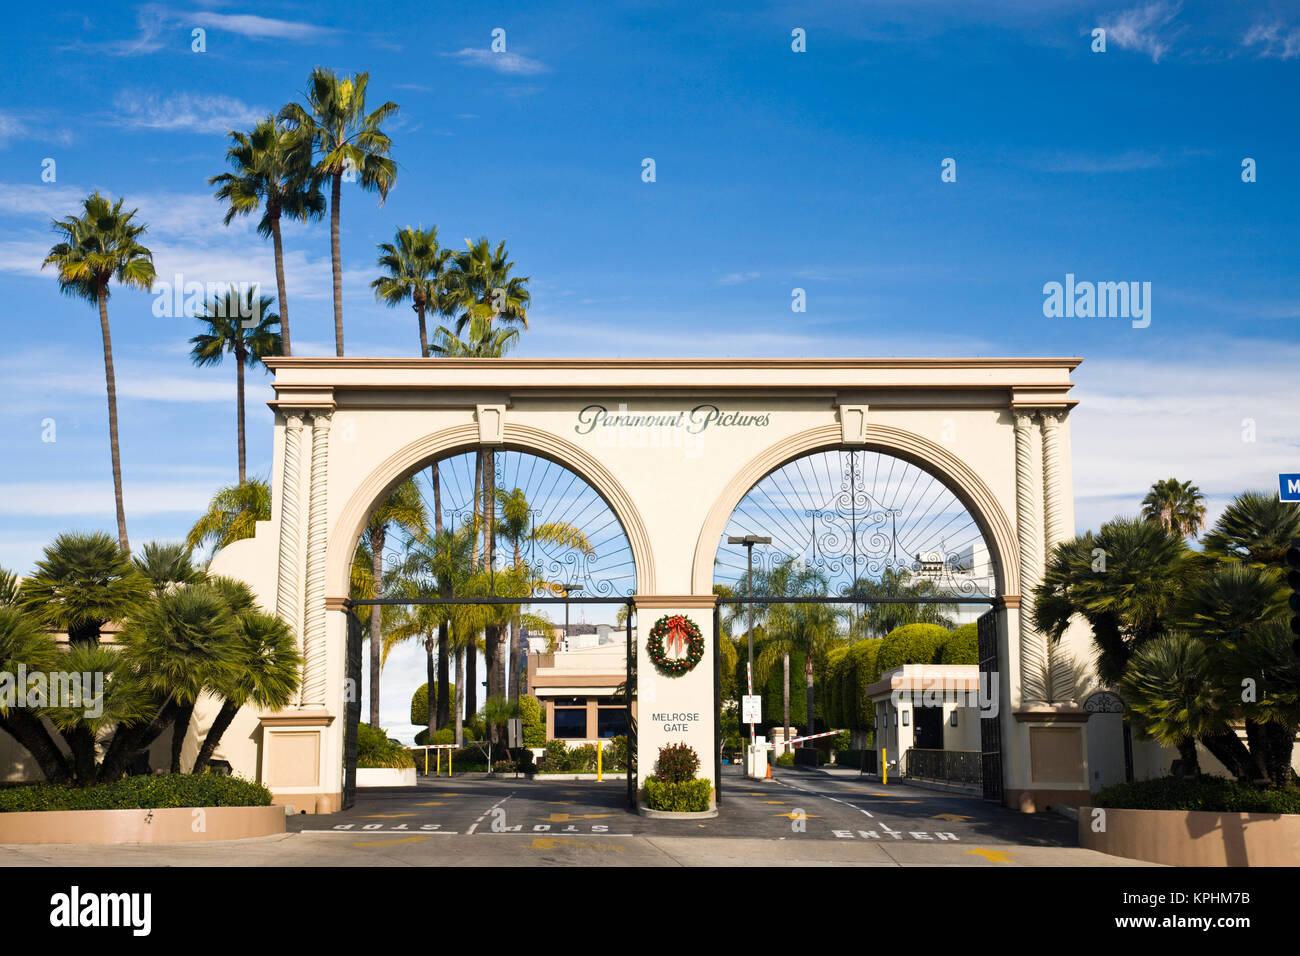 USA, California, Los Angeles. Entrance gate to Paramount Studios on Melrose Avenue. Stock Photo